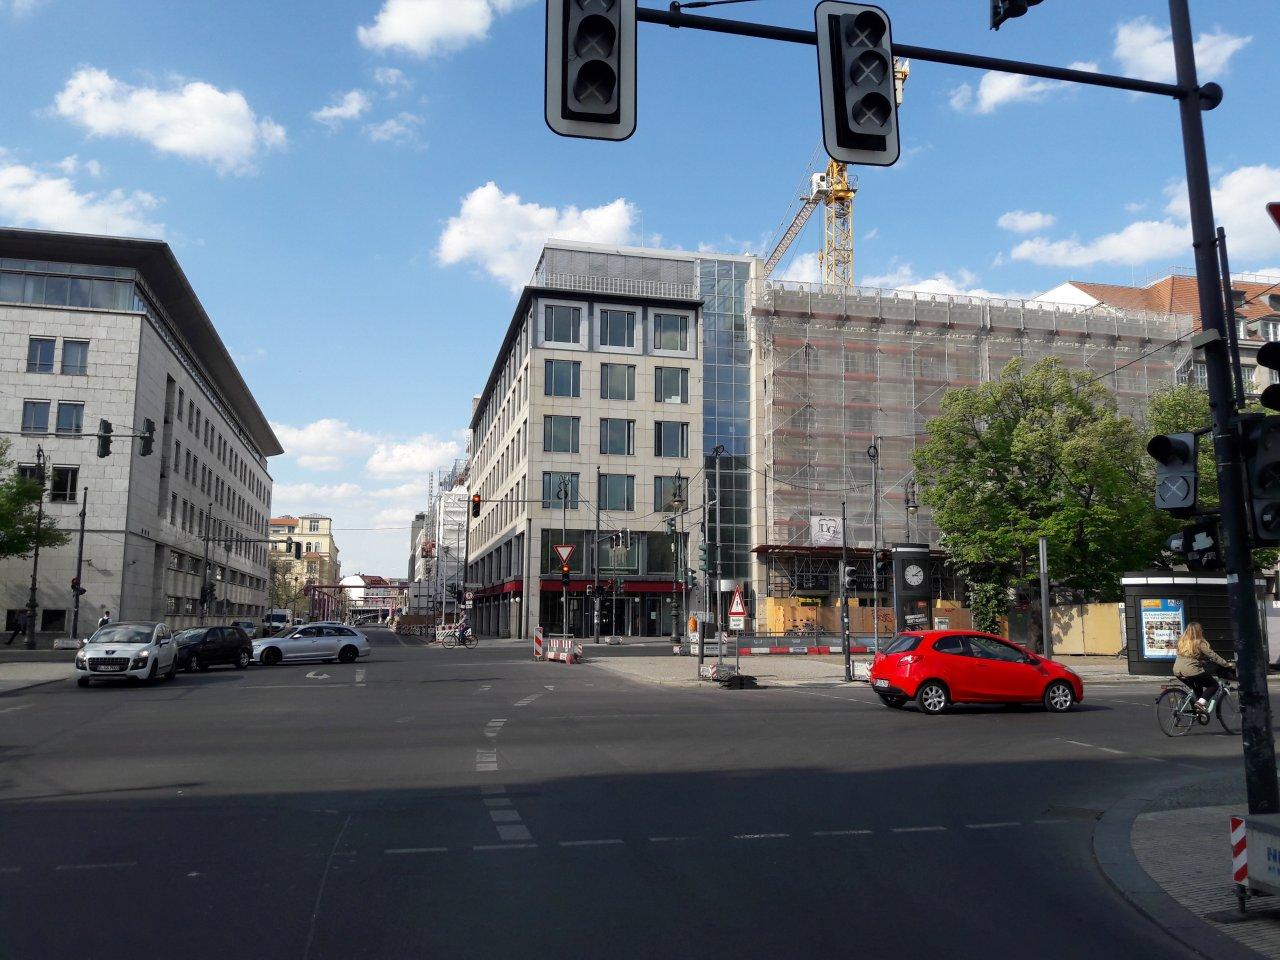 Franzoesische-Palais-Umbau.jpg